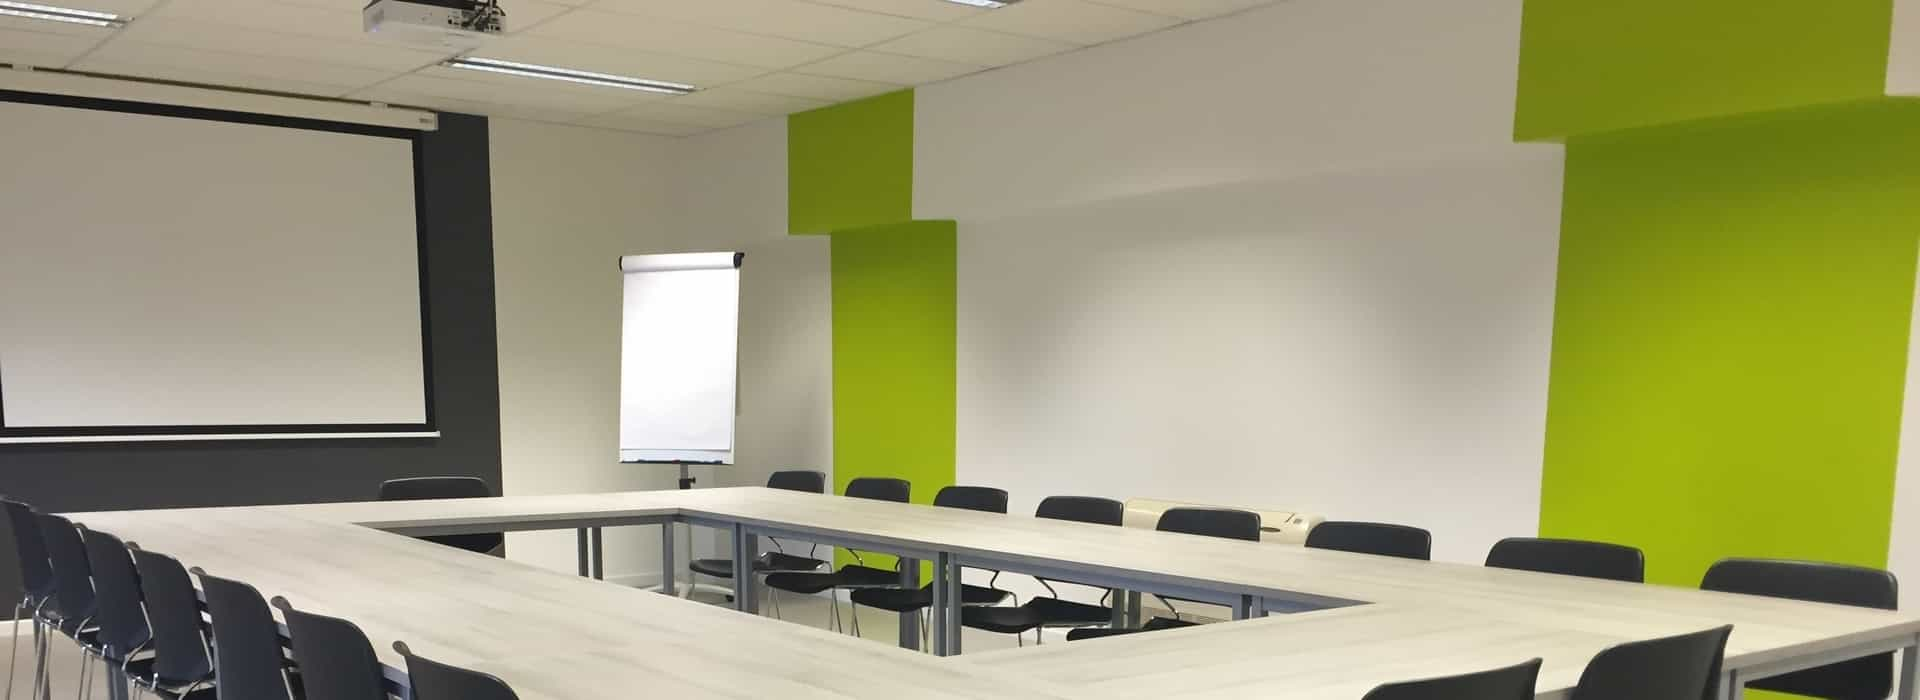 mazevo empty conference room 2